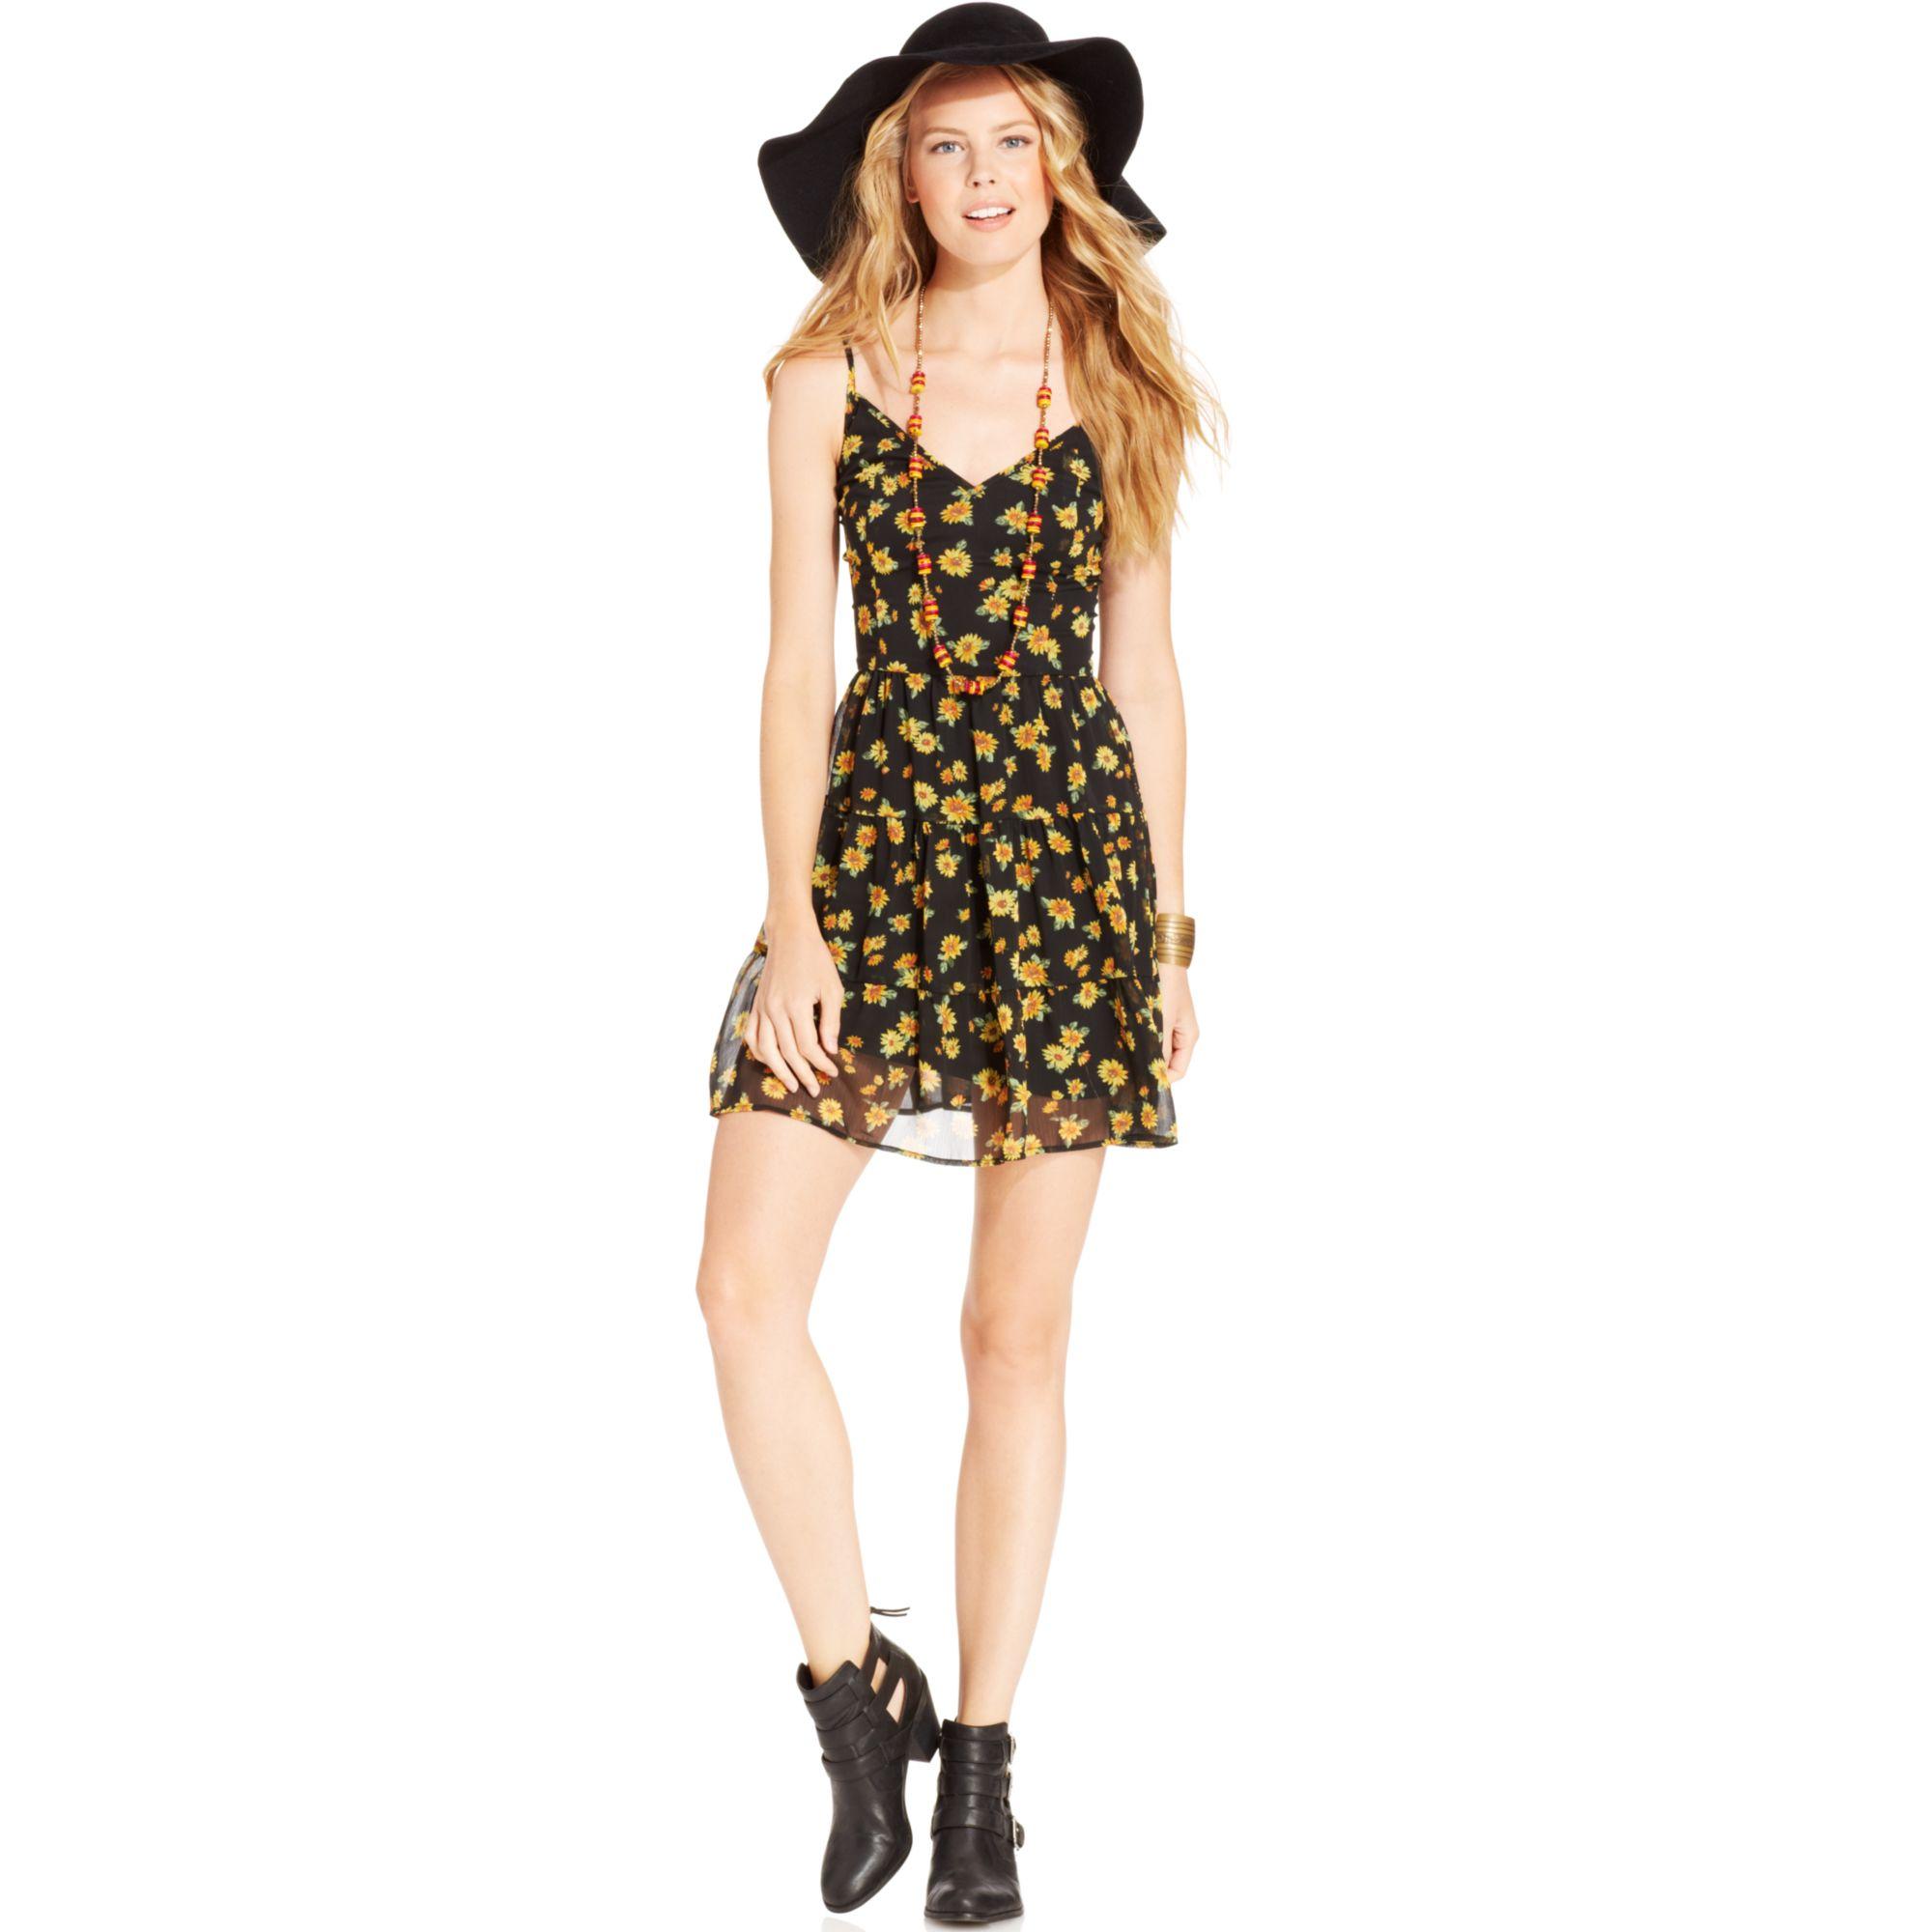 d82b7eb01 American Rag Floral Print Slip Dress in Green - Lyst